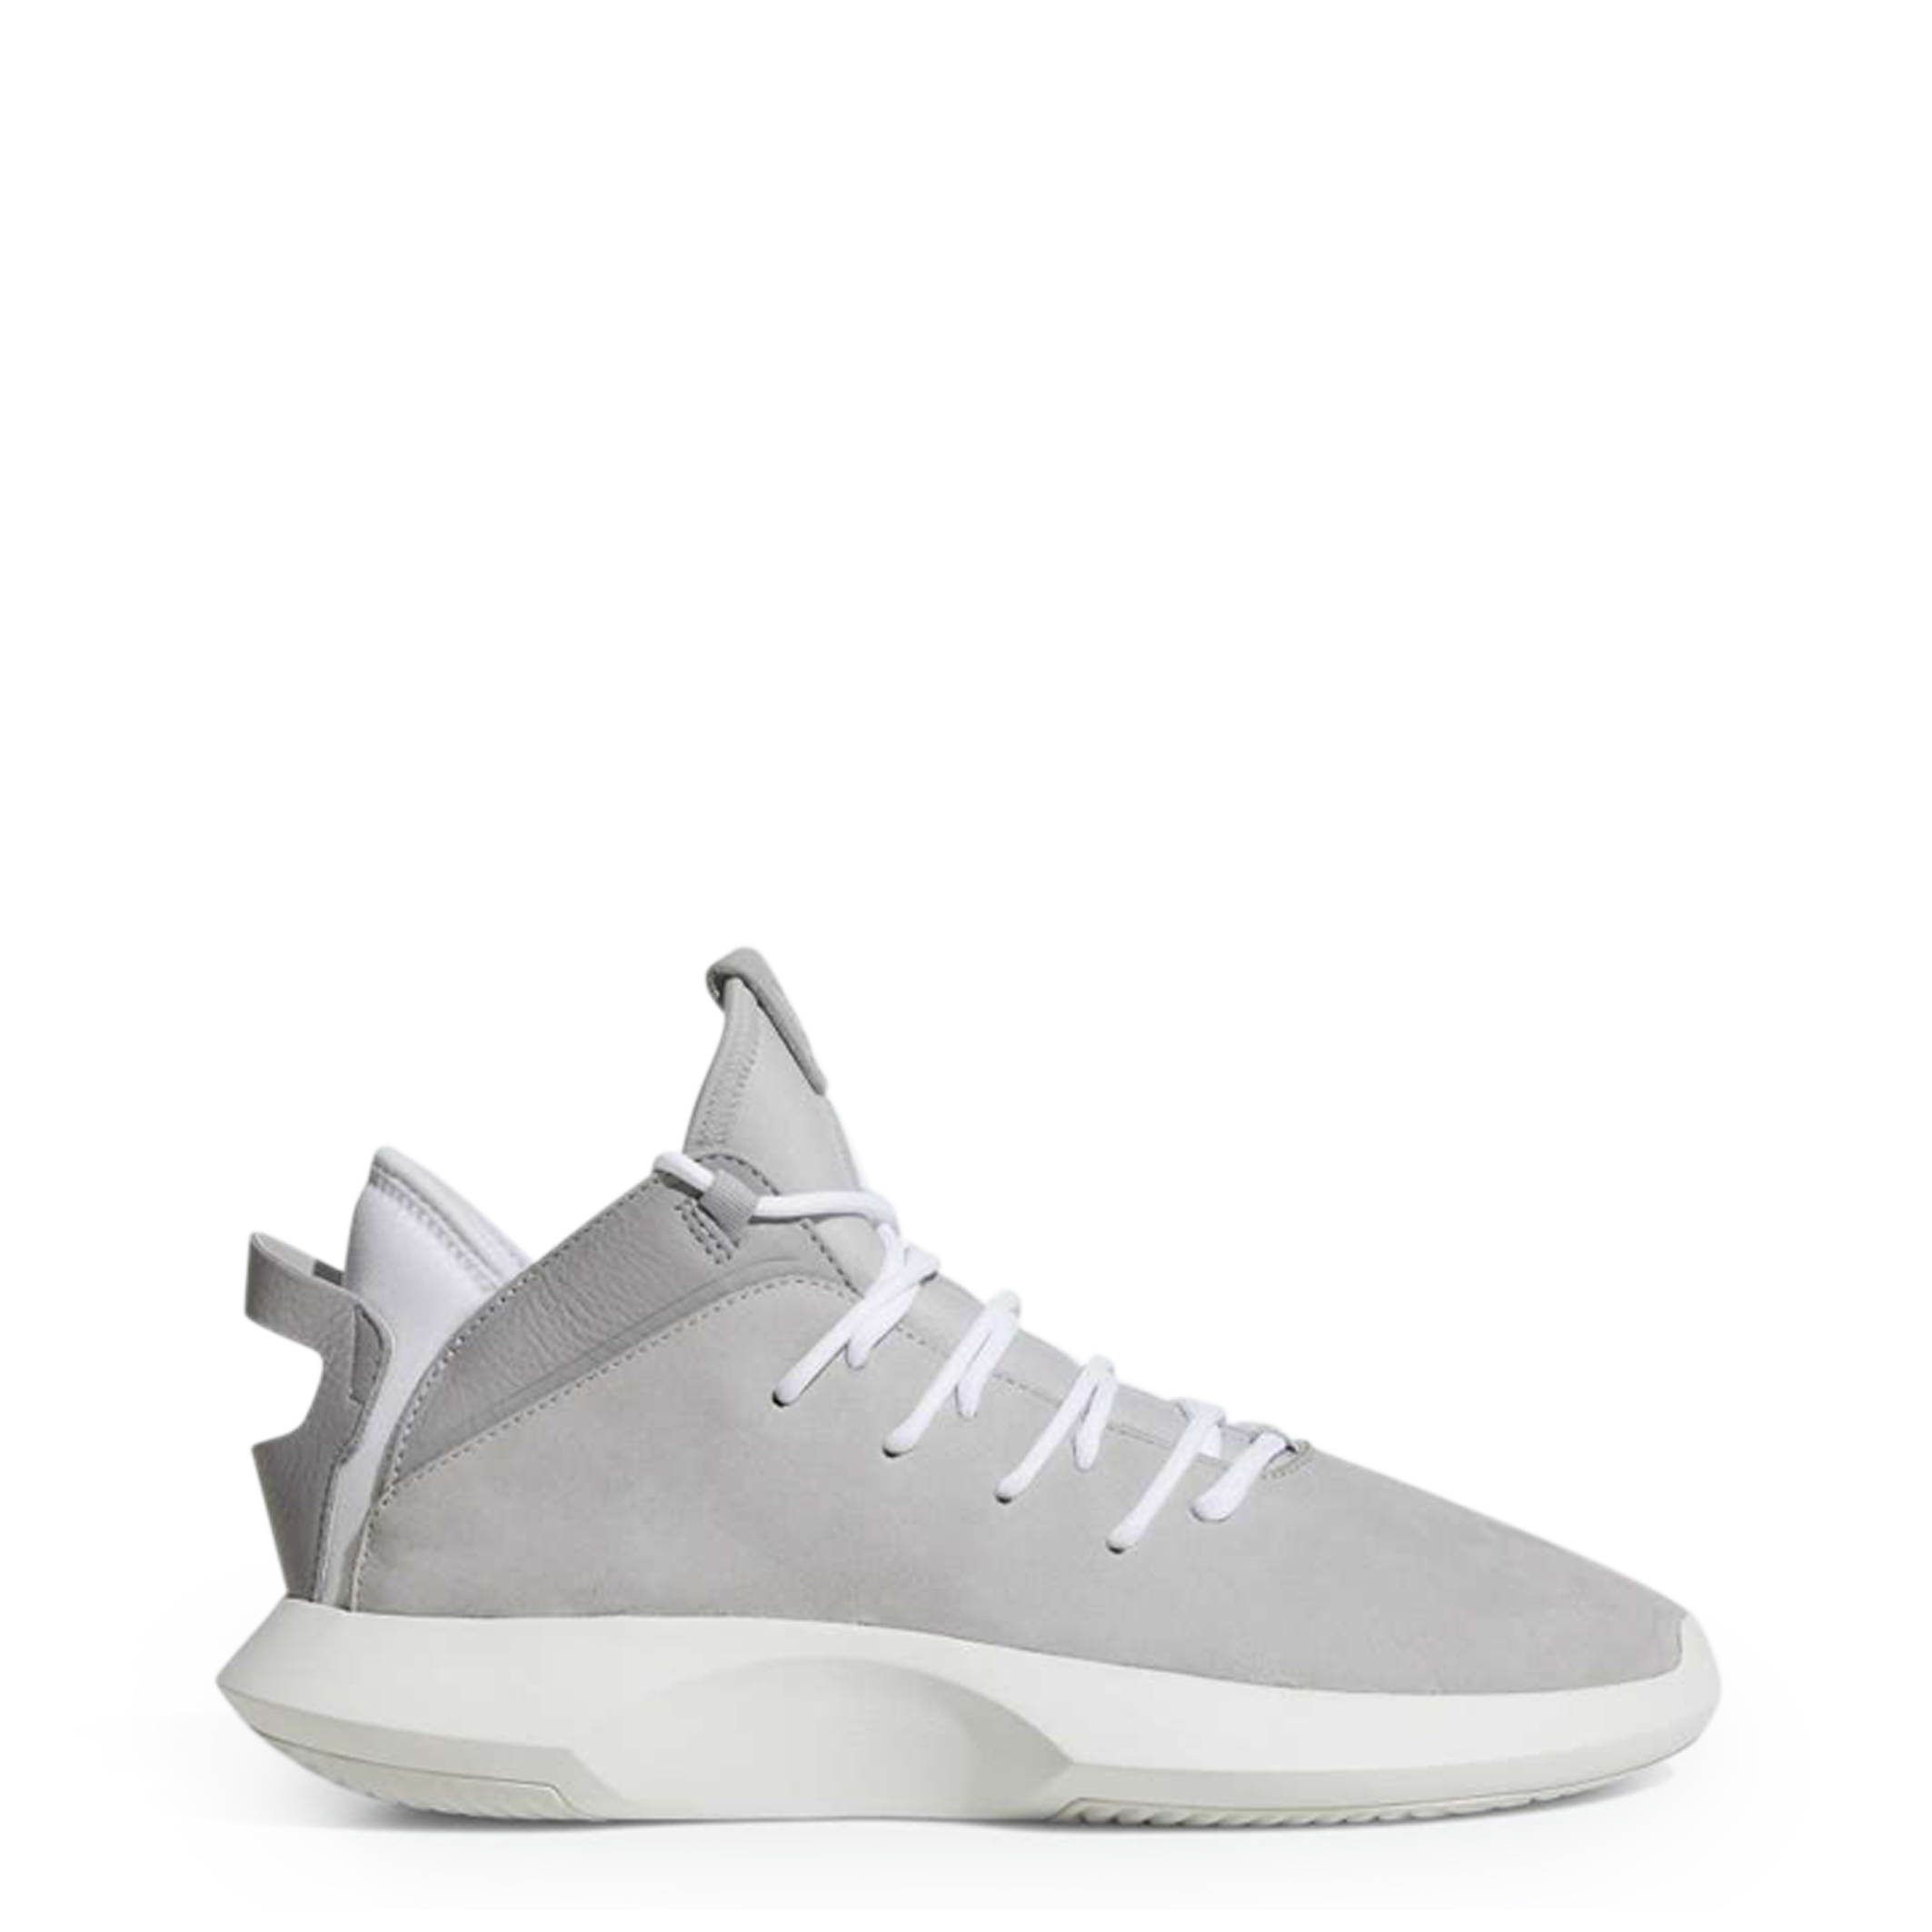 Adidas CRAZY_ADV Uomo Grigio 97927